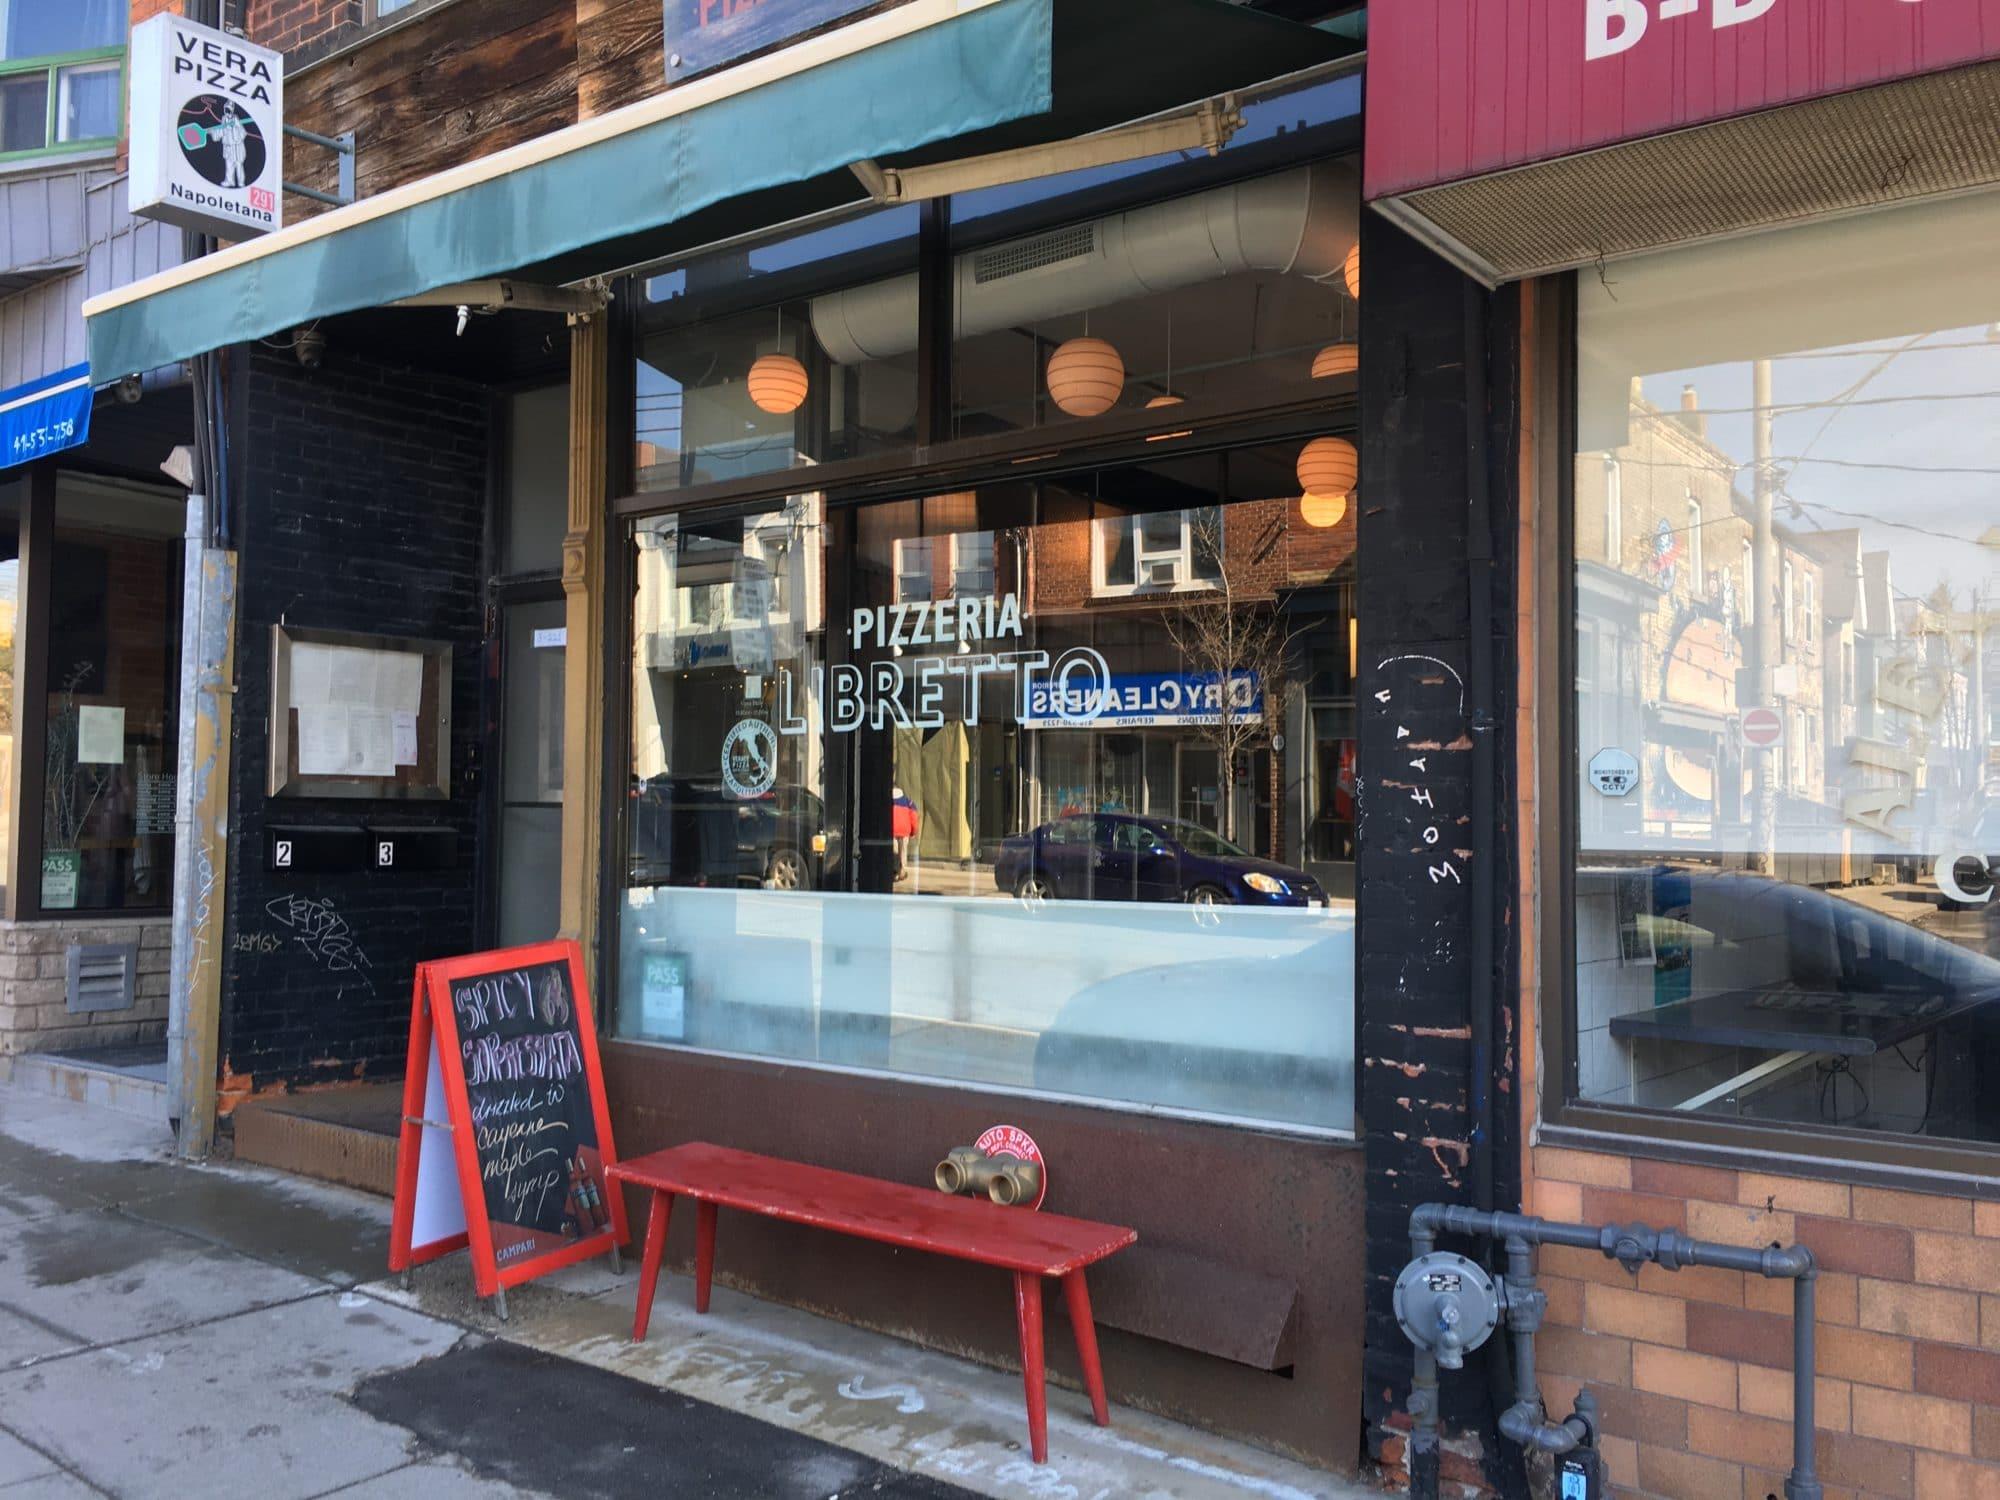 Ossington Restaurants: Pizzeria Libretto is the neighbourhoods OG pizza place.